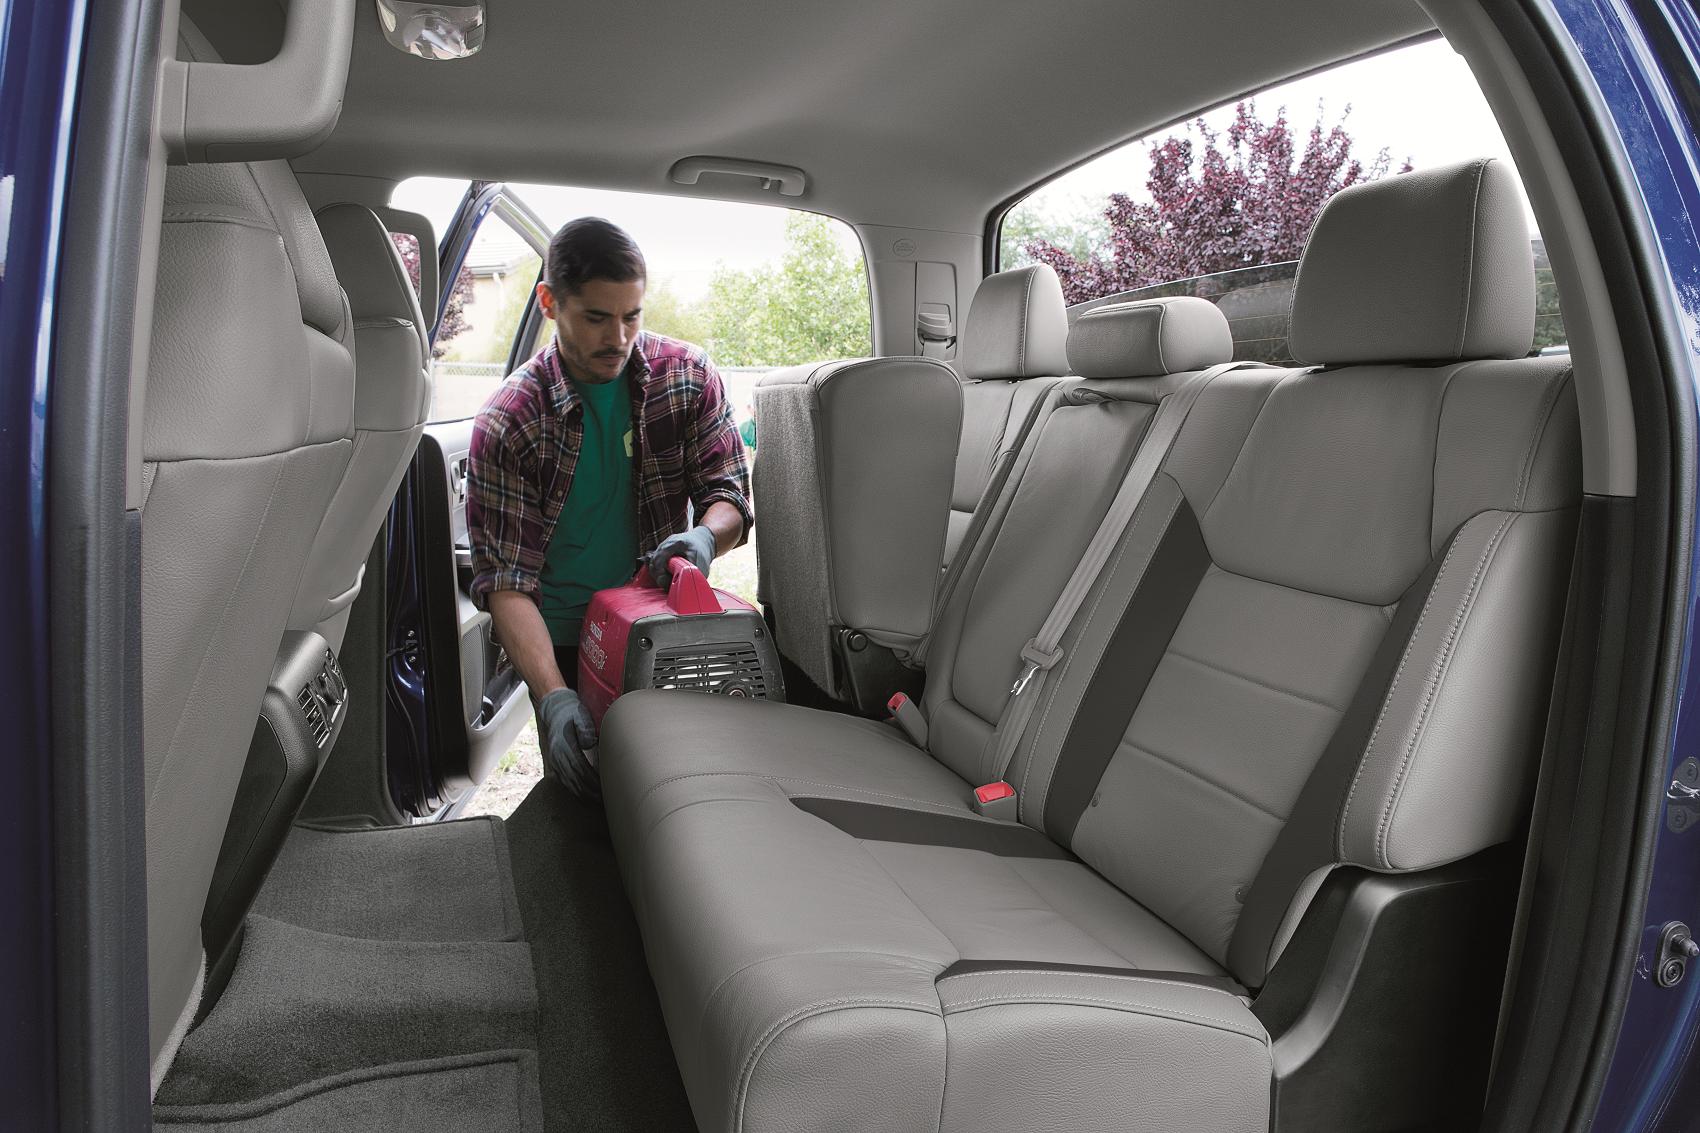 2019 Toyota Tundra Rear Seat Storage